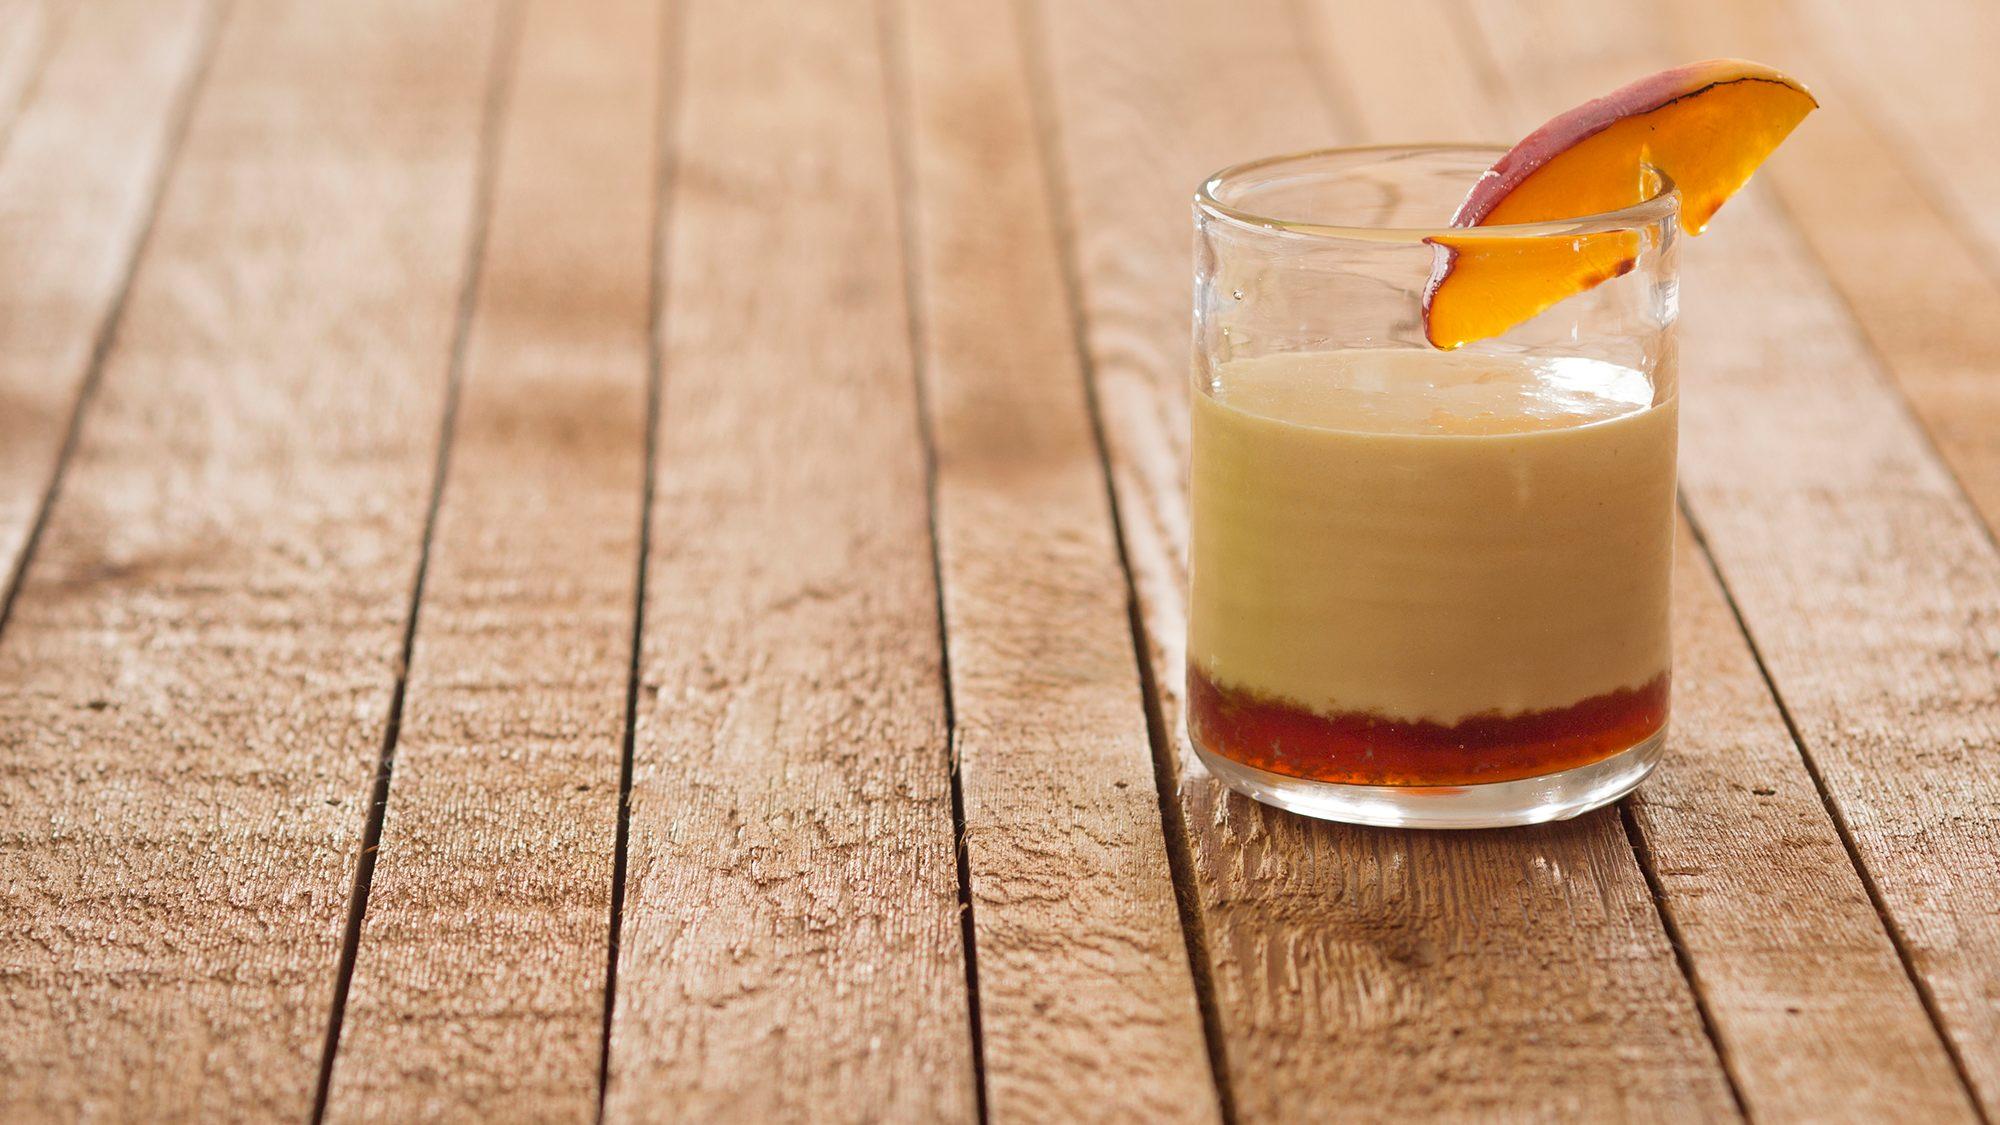 McCormick Gourmet Peach and Vanilla Brulée Cocktail